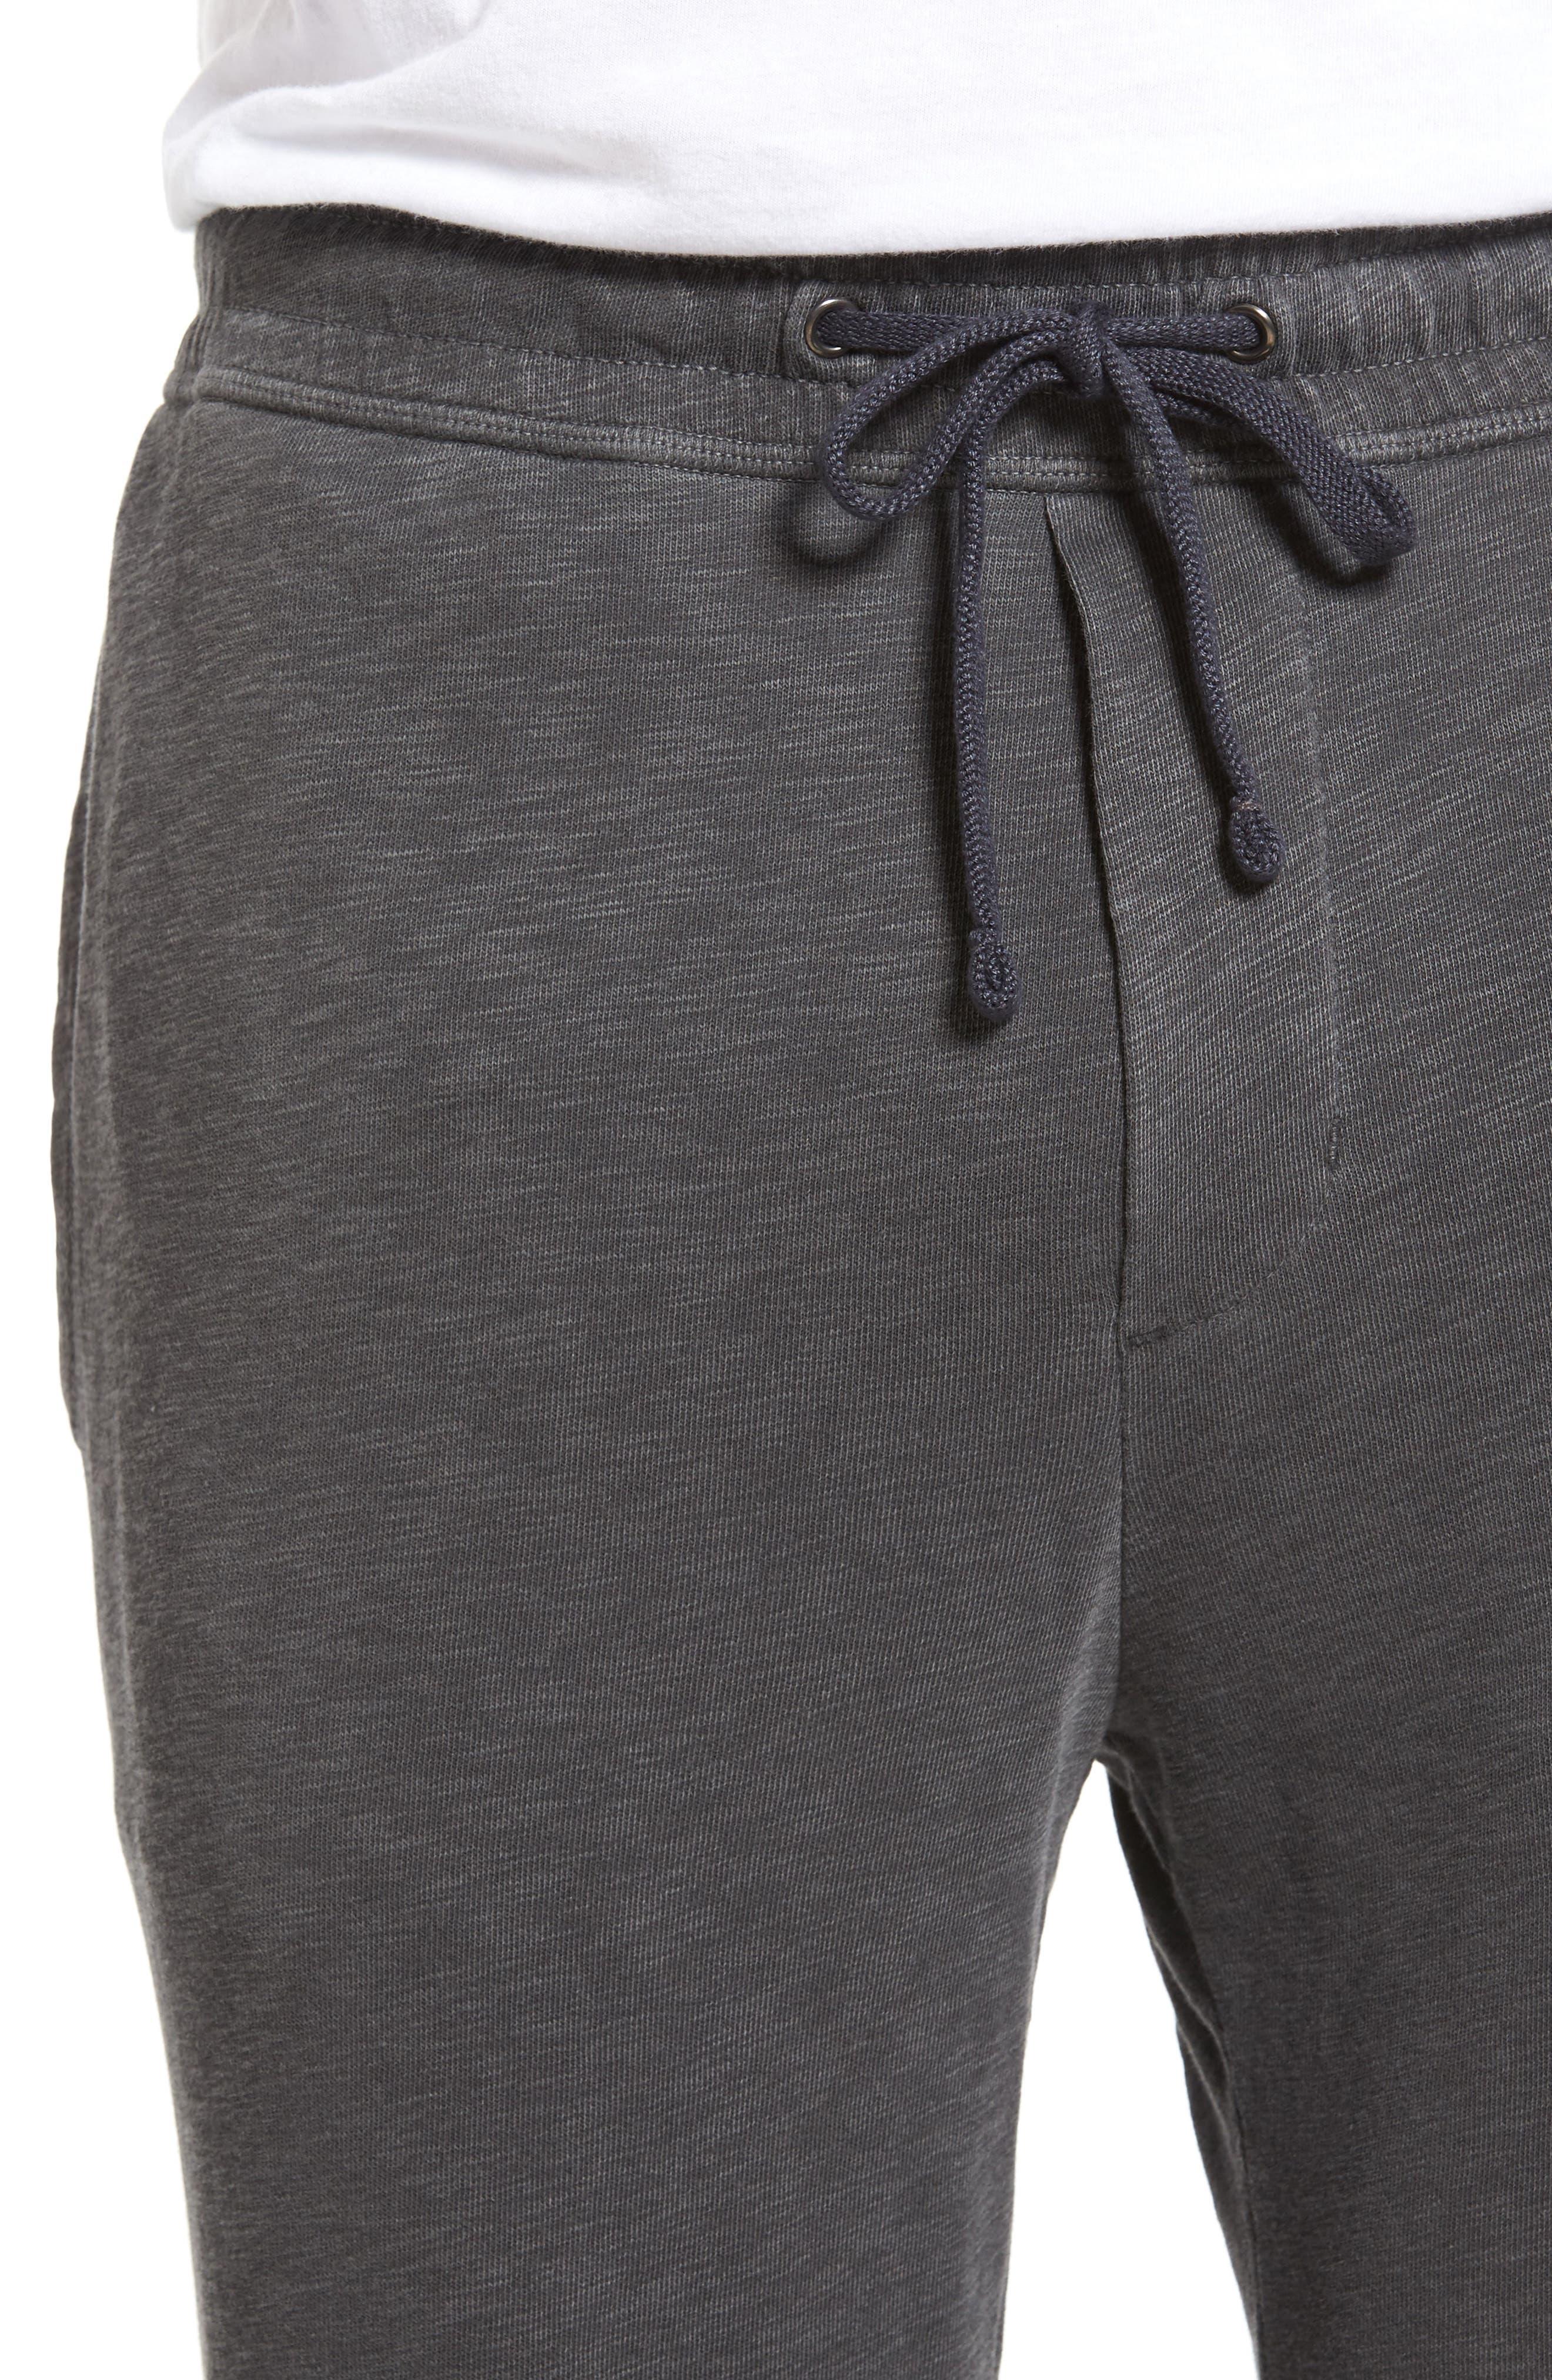 'Classic' Sweatpants,                             Alternate thumbnail 33, color,